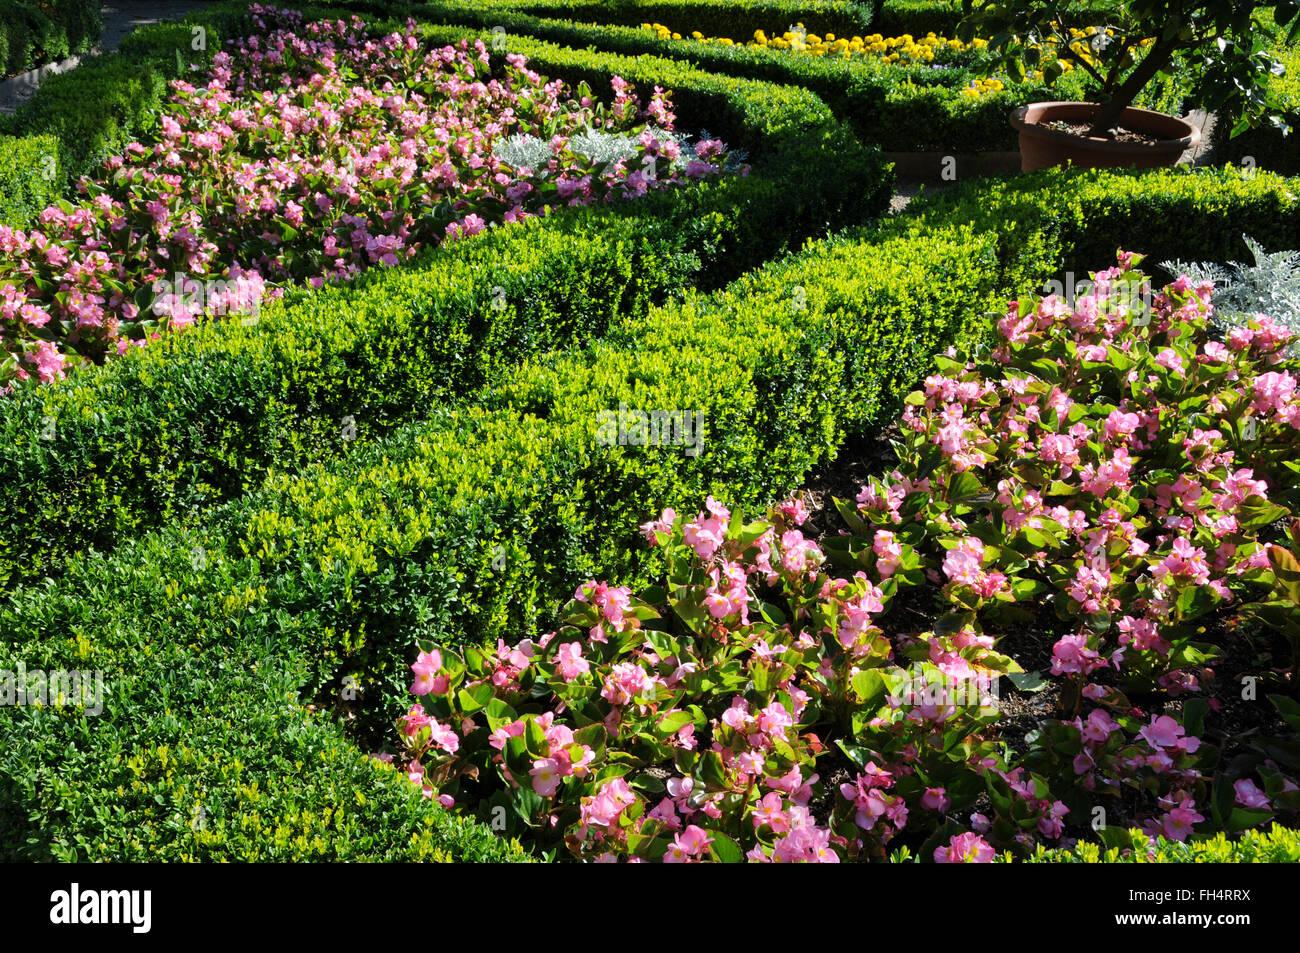 Box-tree hedge - Stock Image